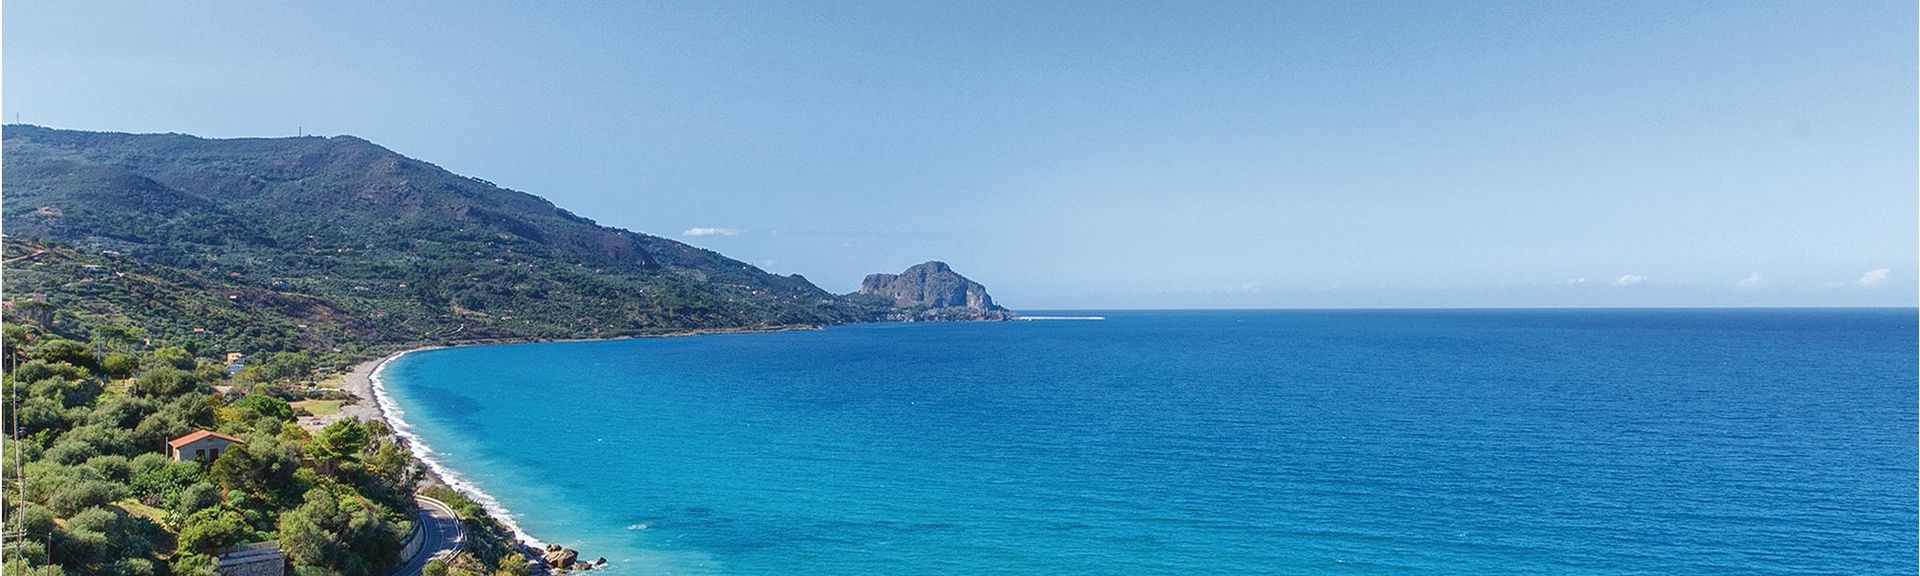 Cerami, Sicilië, Italië